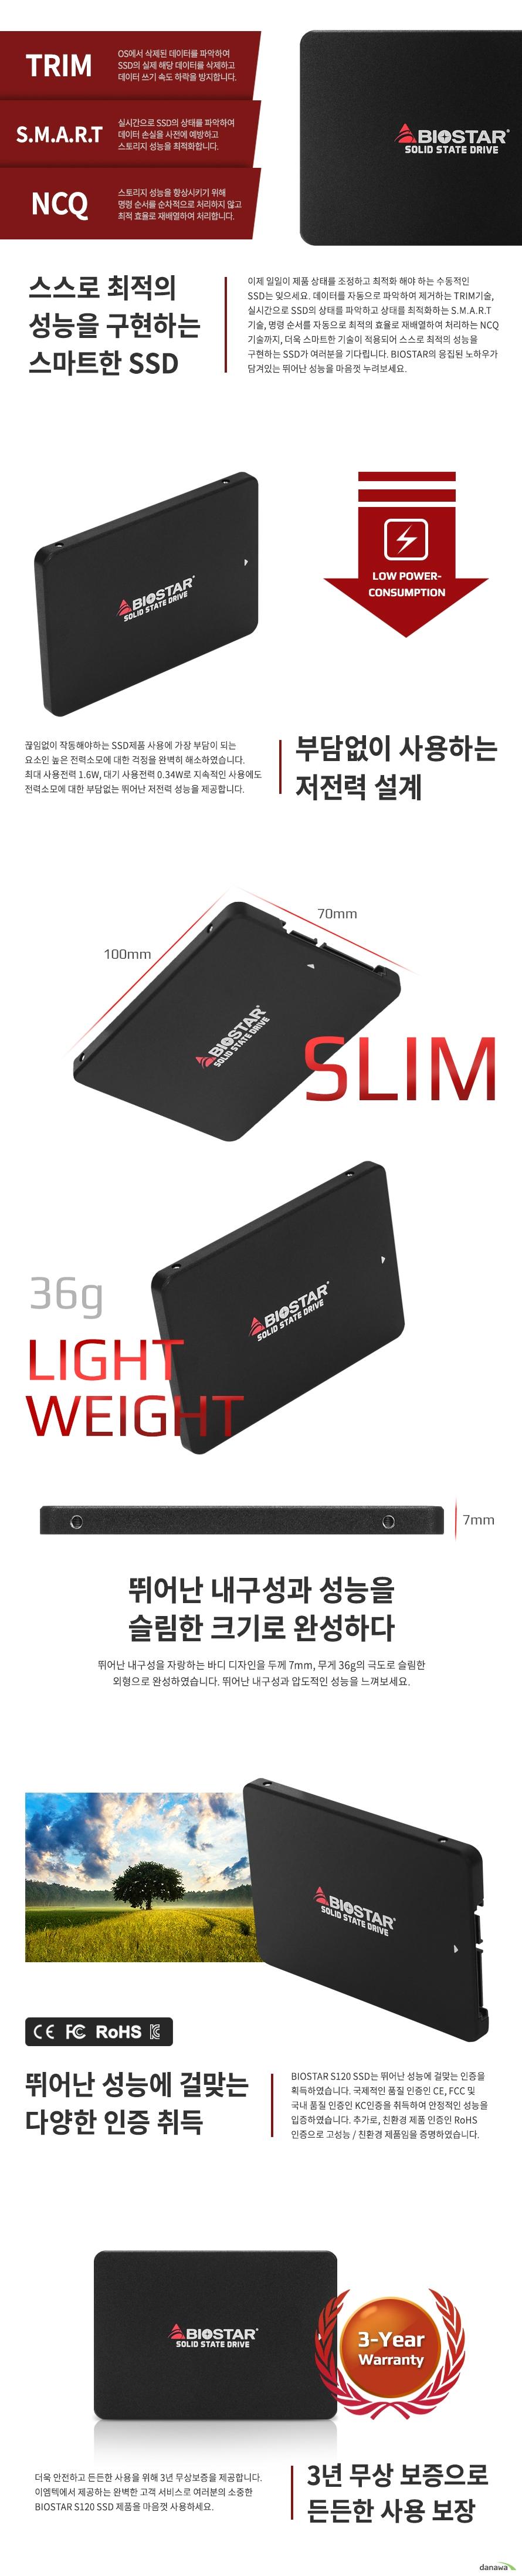 BIOSTAR S120 (256GB)